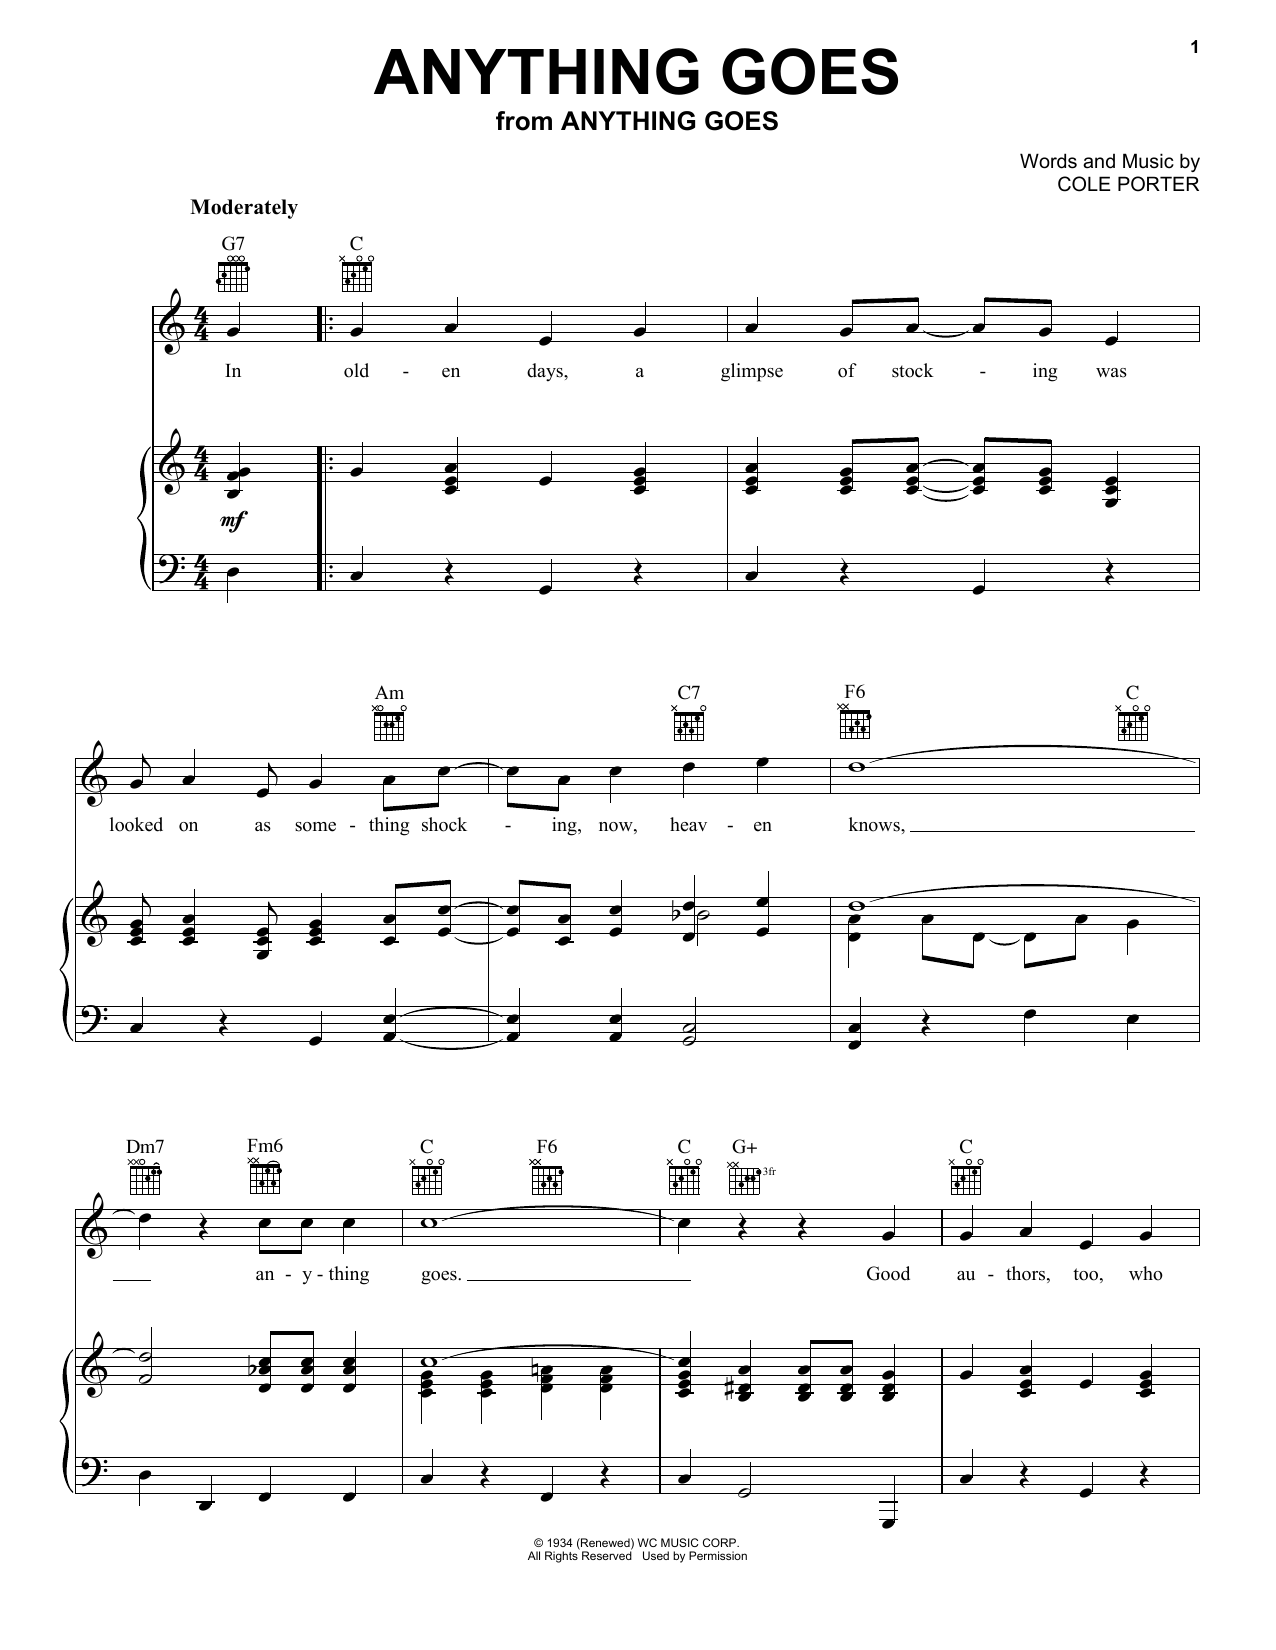 Frank Sinatra 'Anything Goes' Sheet Music Notes, Chords   Download  Printable Piano, Vocal & Guitar Right Hand Melody   SKU 15